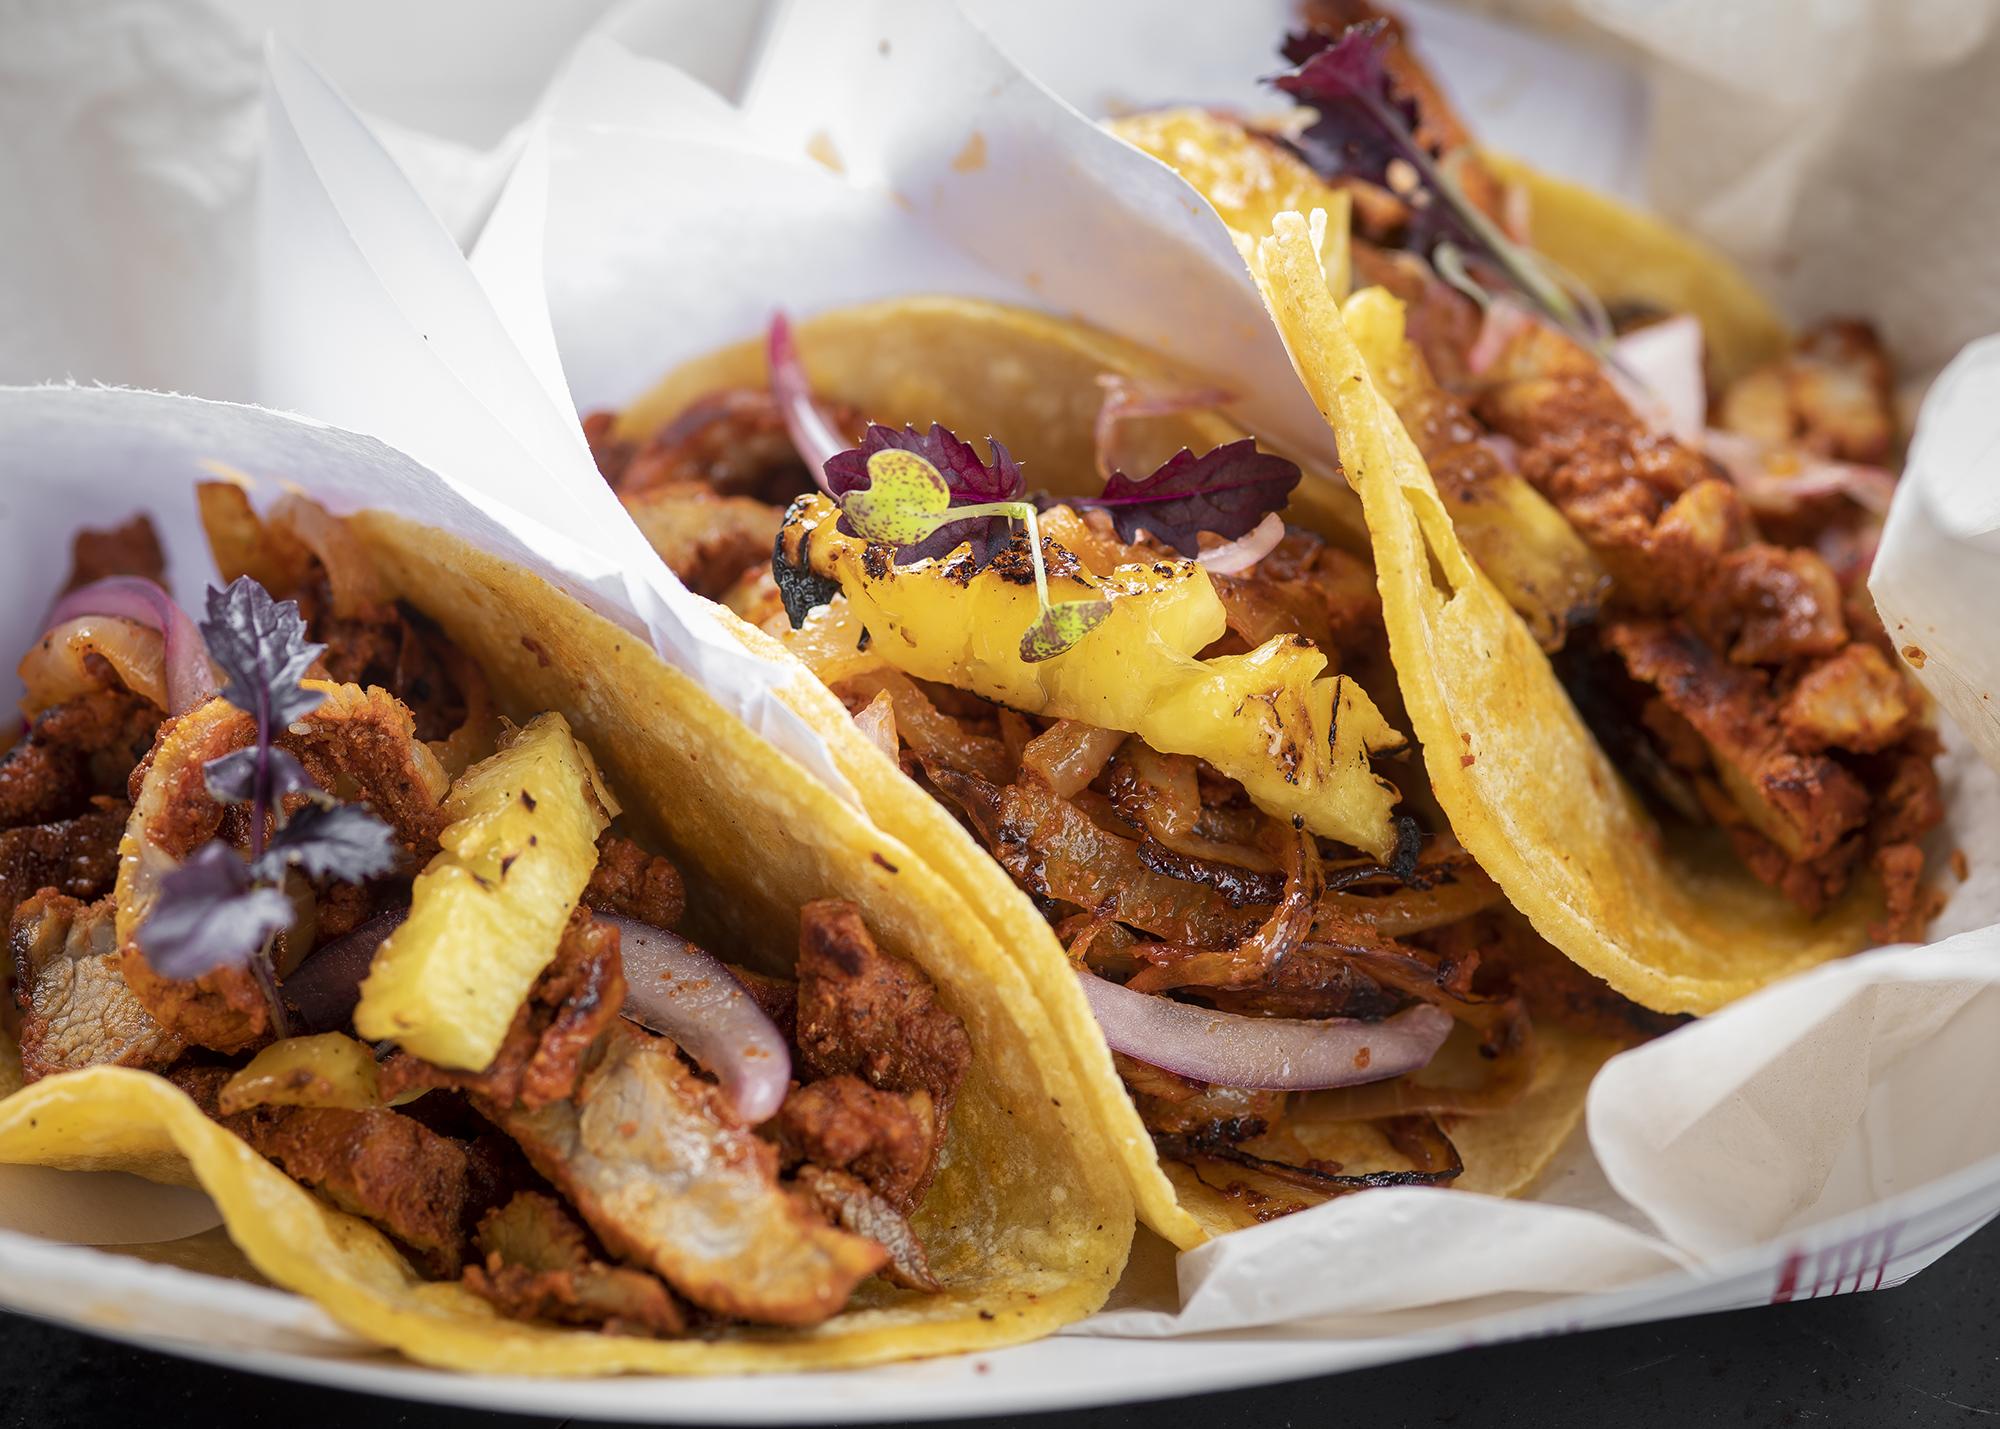 Three tacos on corn tortillas stuffed with al pastor.